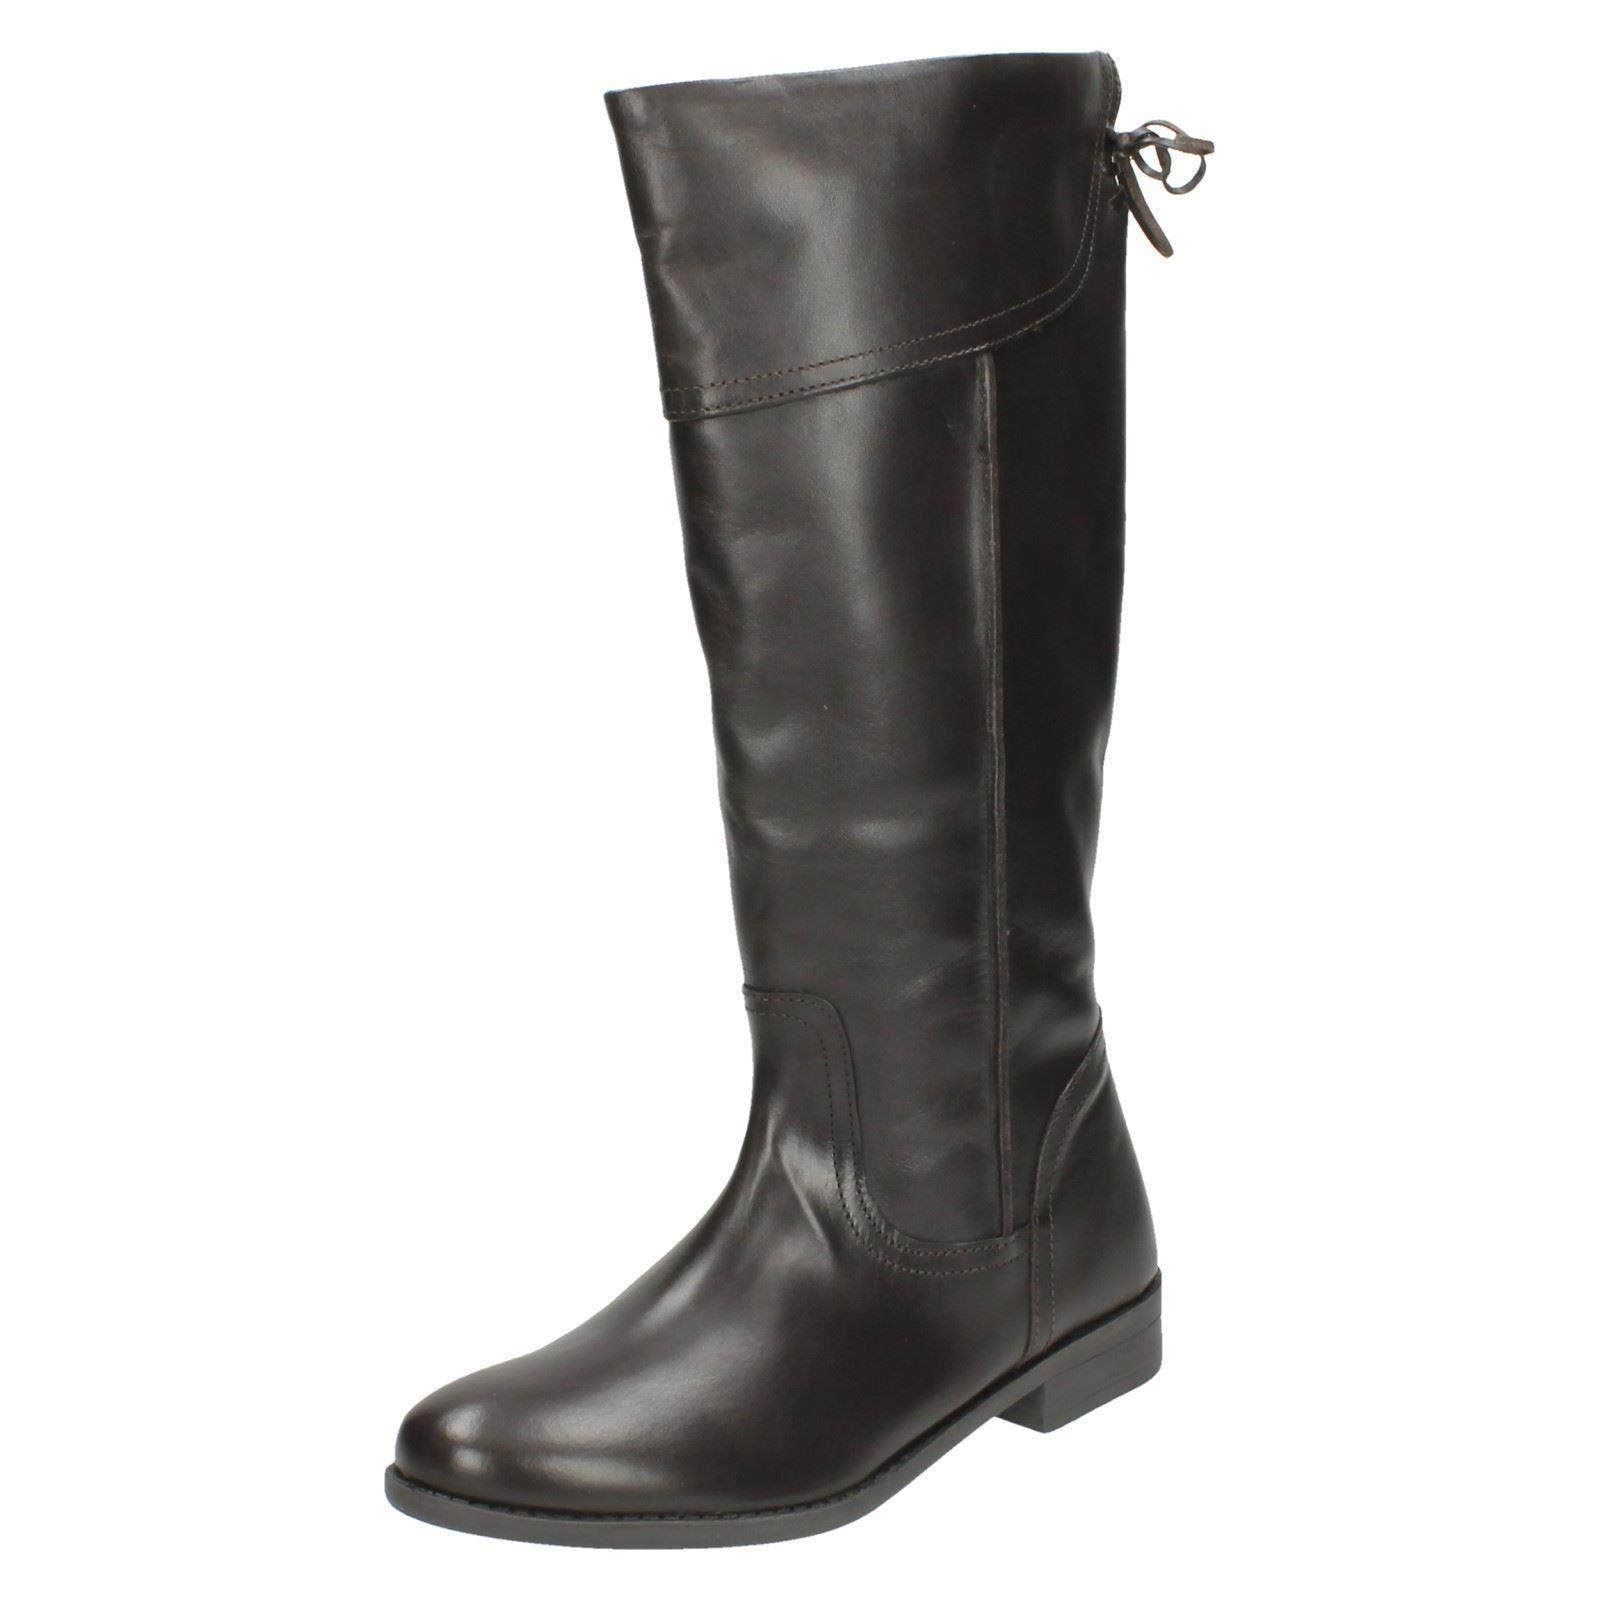 Señoras punto en la rodilla Botas altas lboot/PT01E